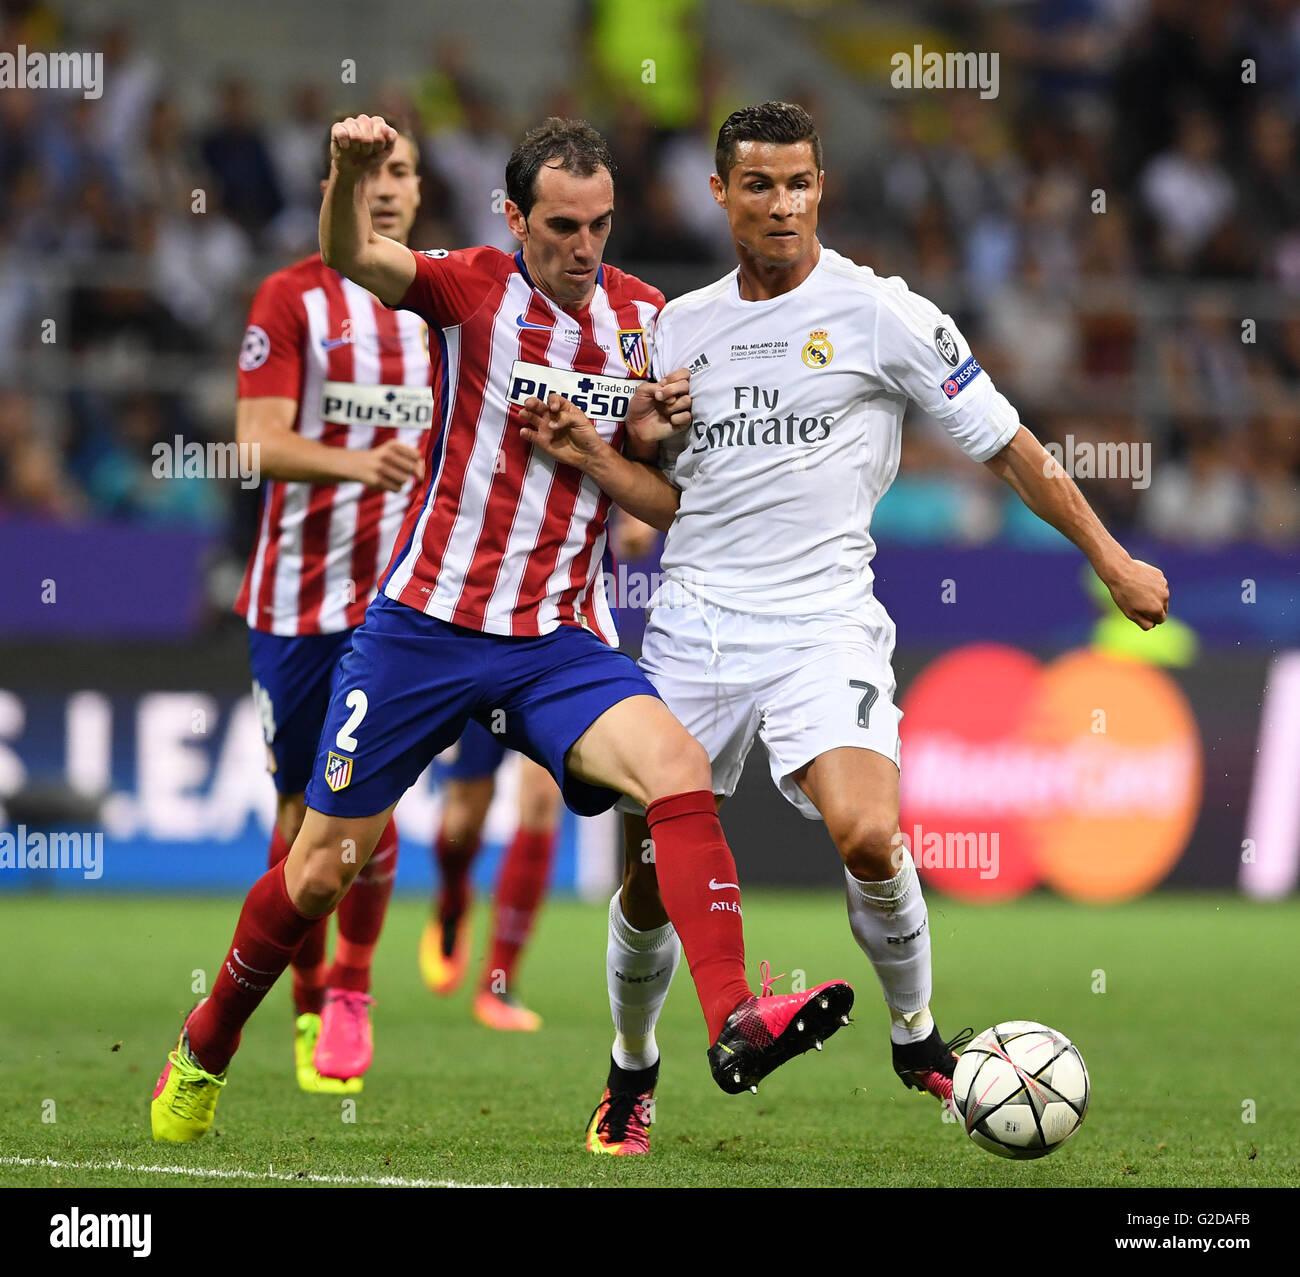 Milan Italy 28th May 2016 Diego Godin of Atletico Madrid L